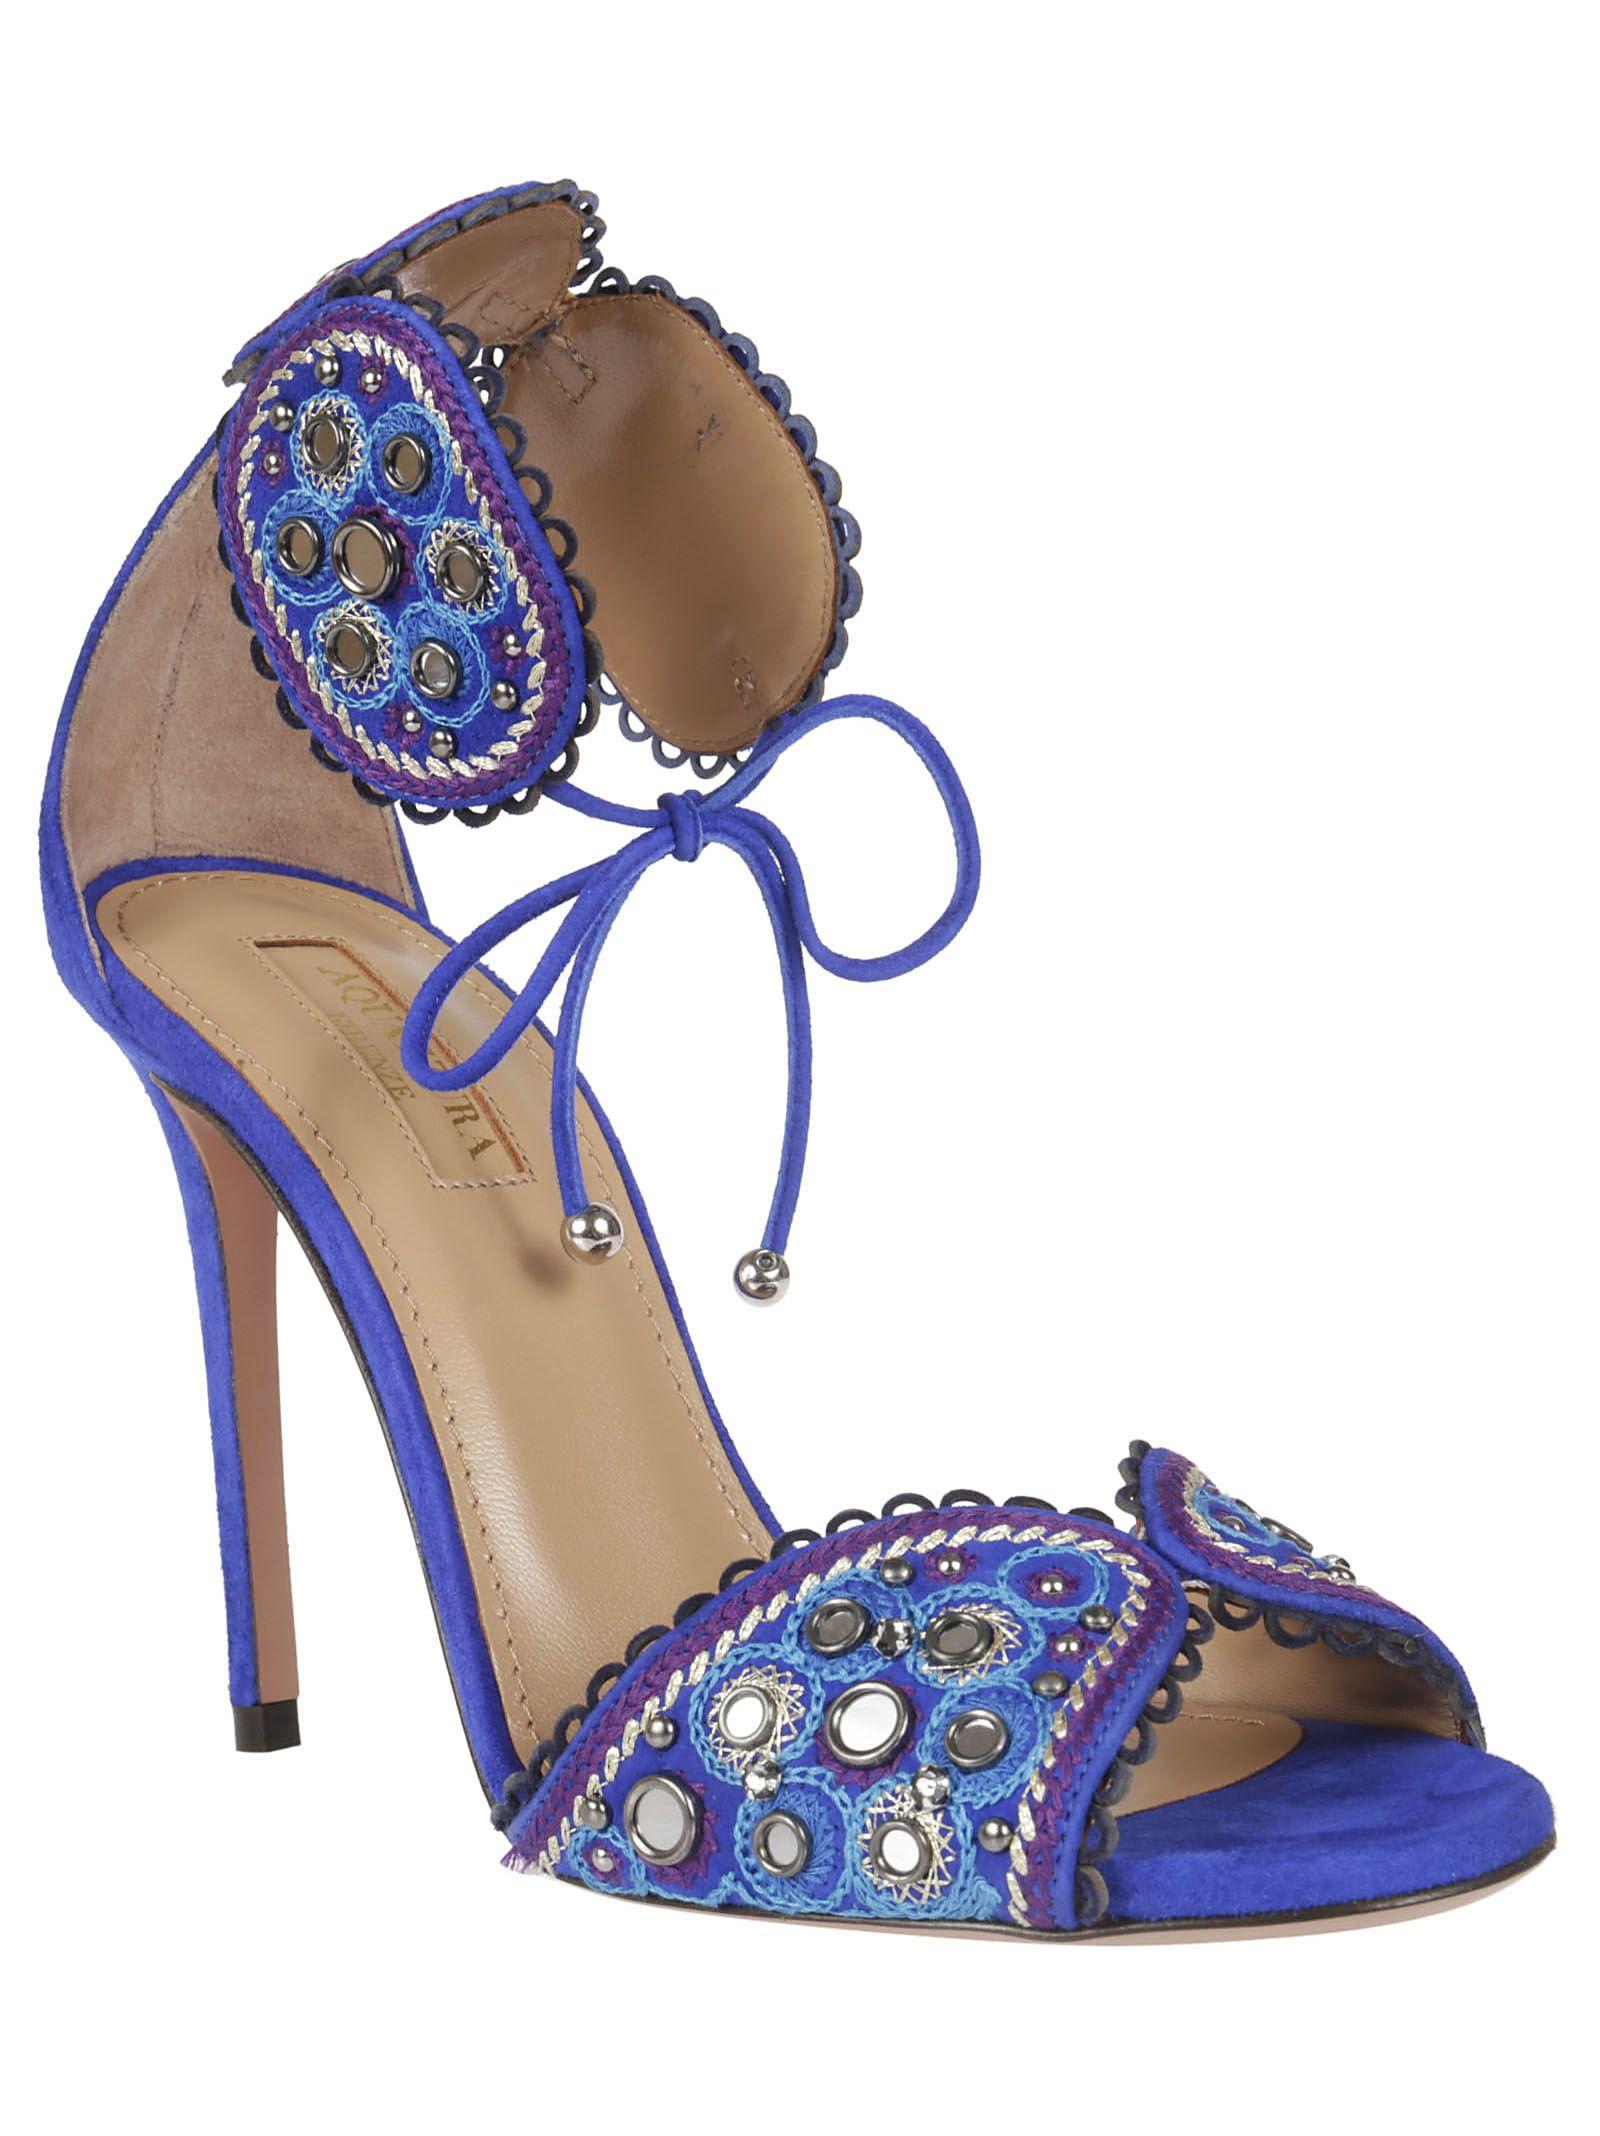 Jaipur sandals - Blue Aquazzura Un99c8Zt9